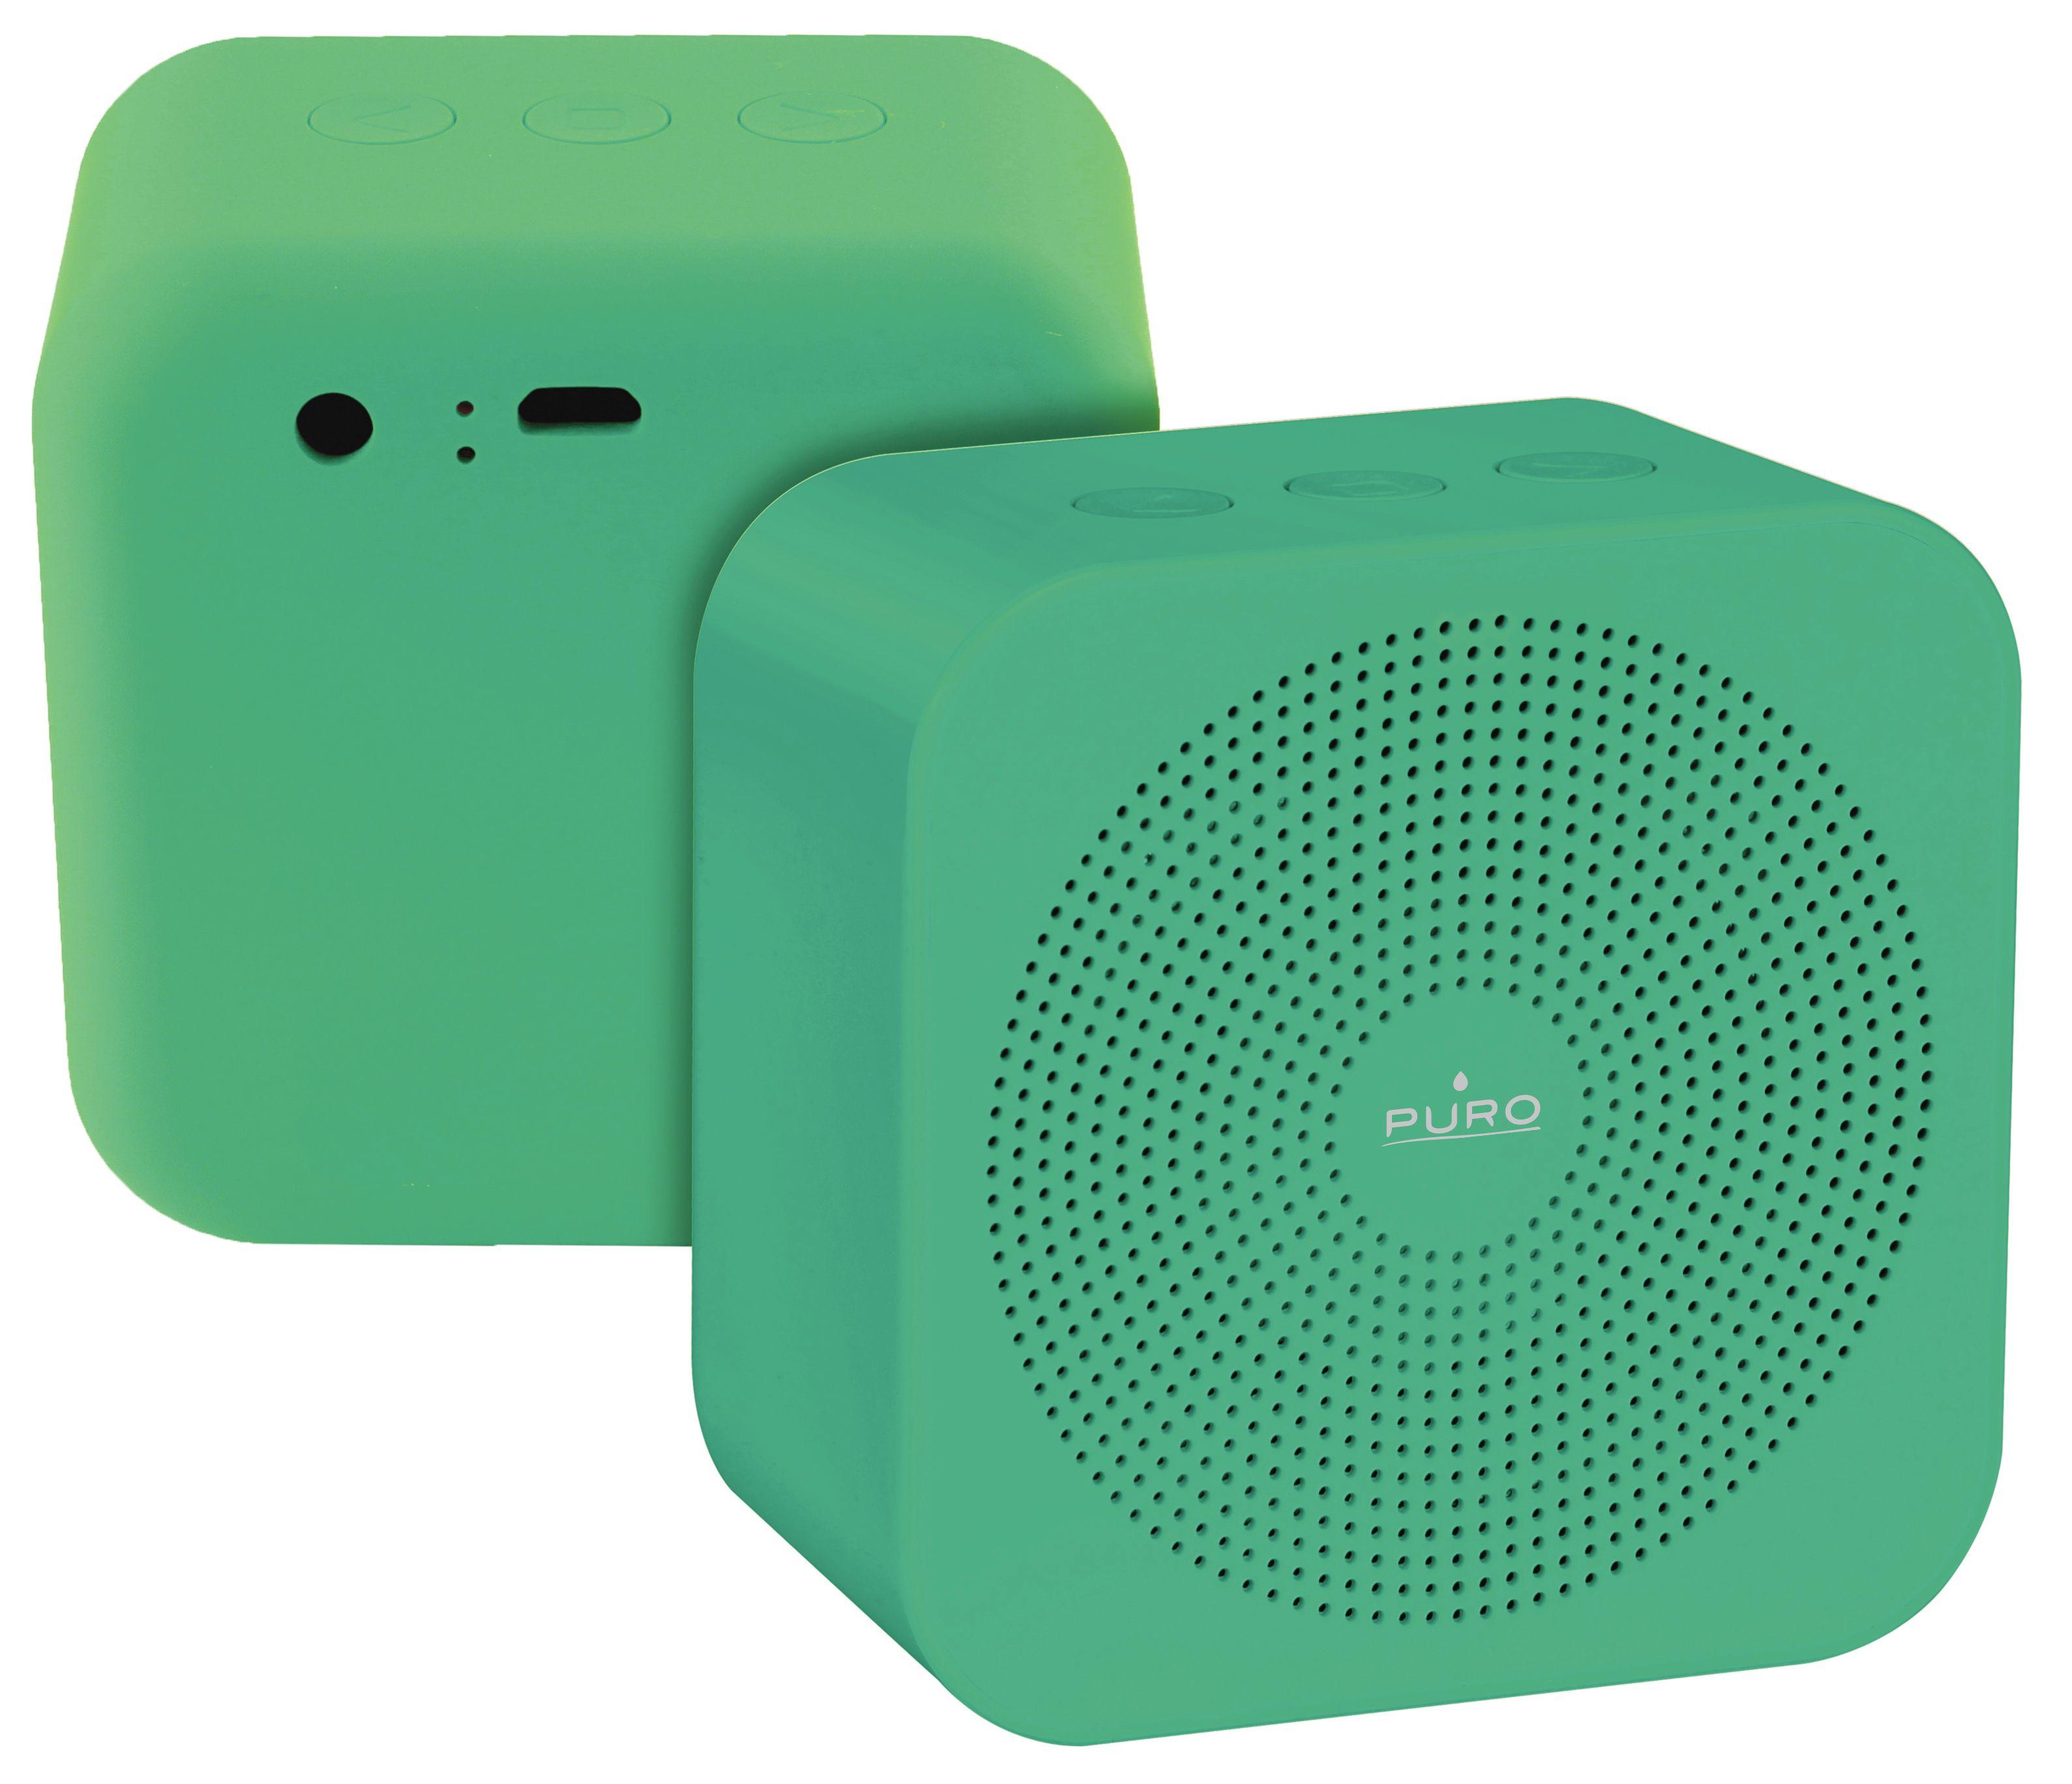 Puro Handy Bluetooth-högtalare - laddbar - iPhonebutiken.se 0770bc7584731